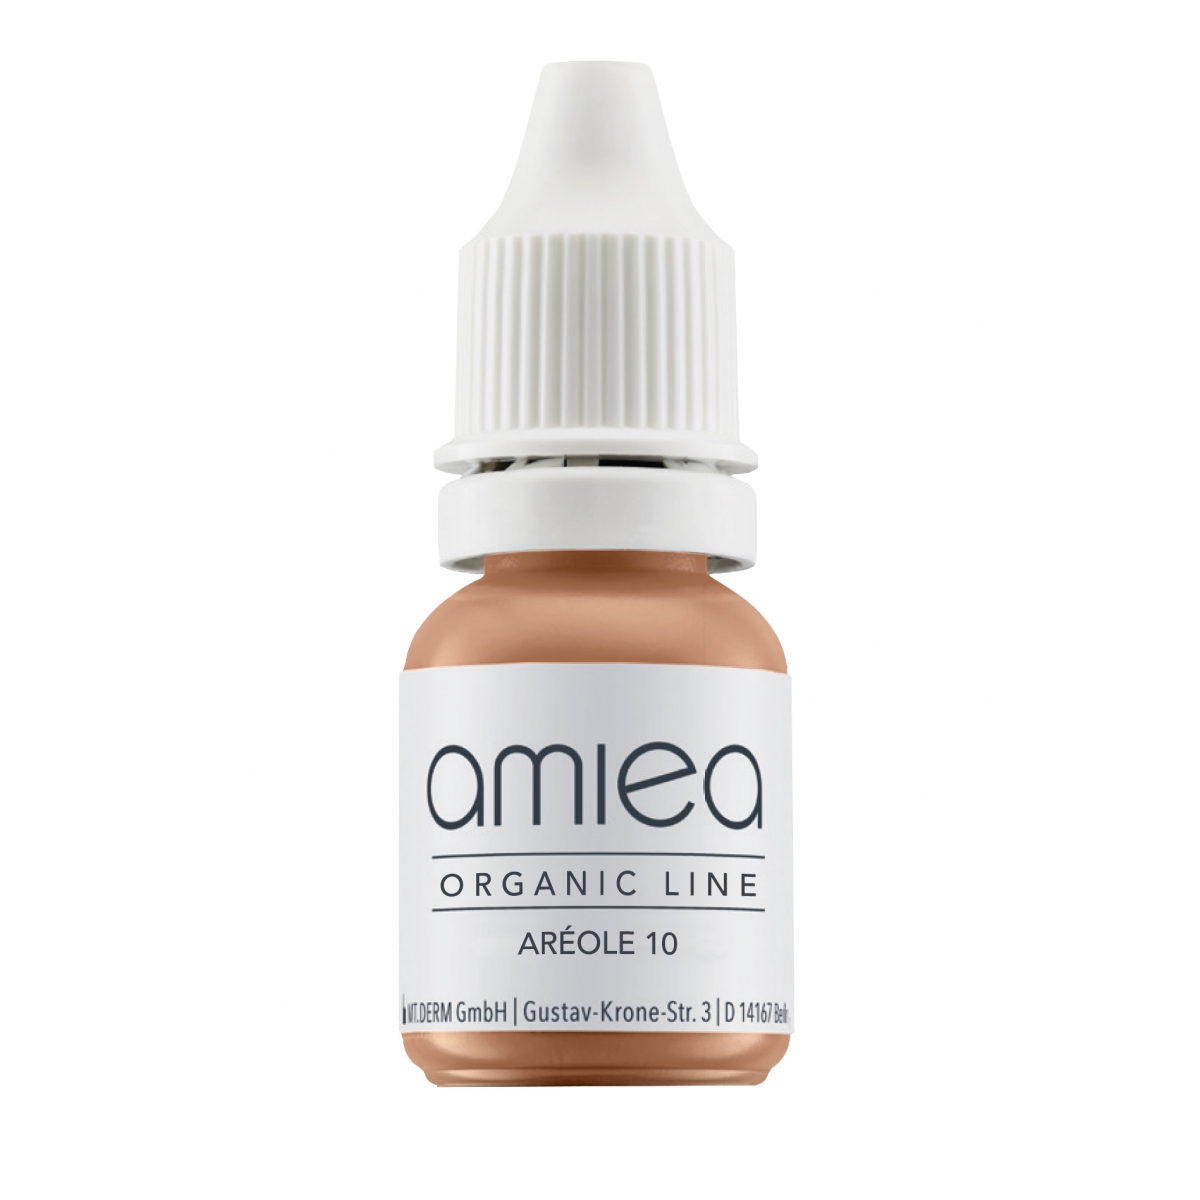 ORGANIC LINE (10ml) - PIGMENT AREOLES 10 ORGANICLINE AMIEA (10 ml)